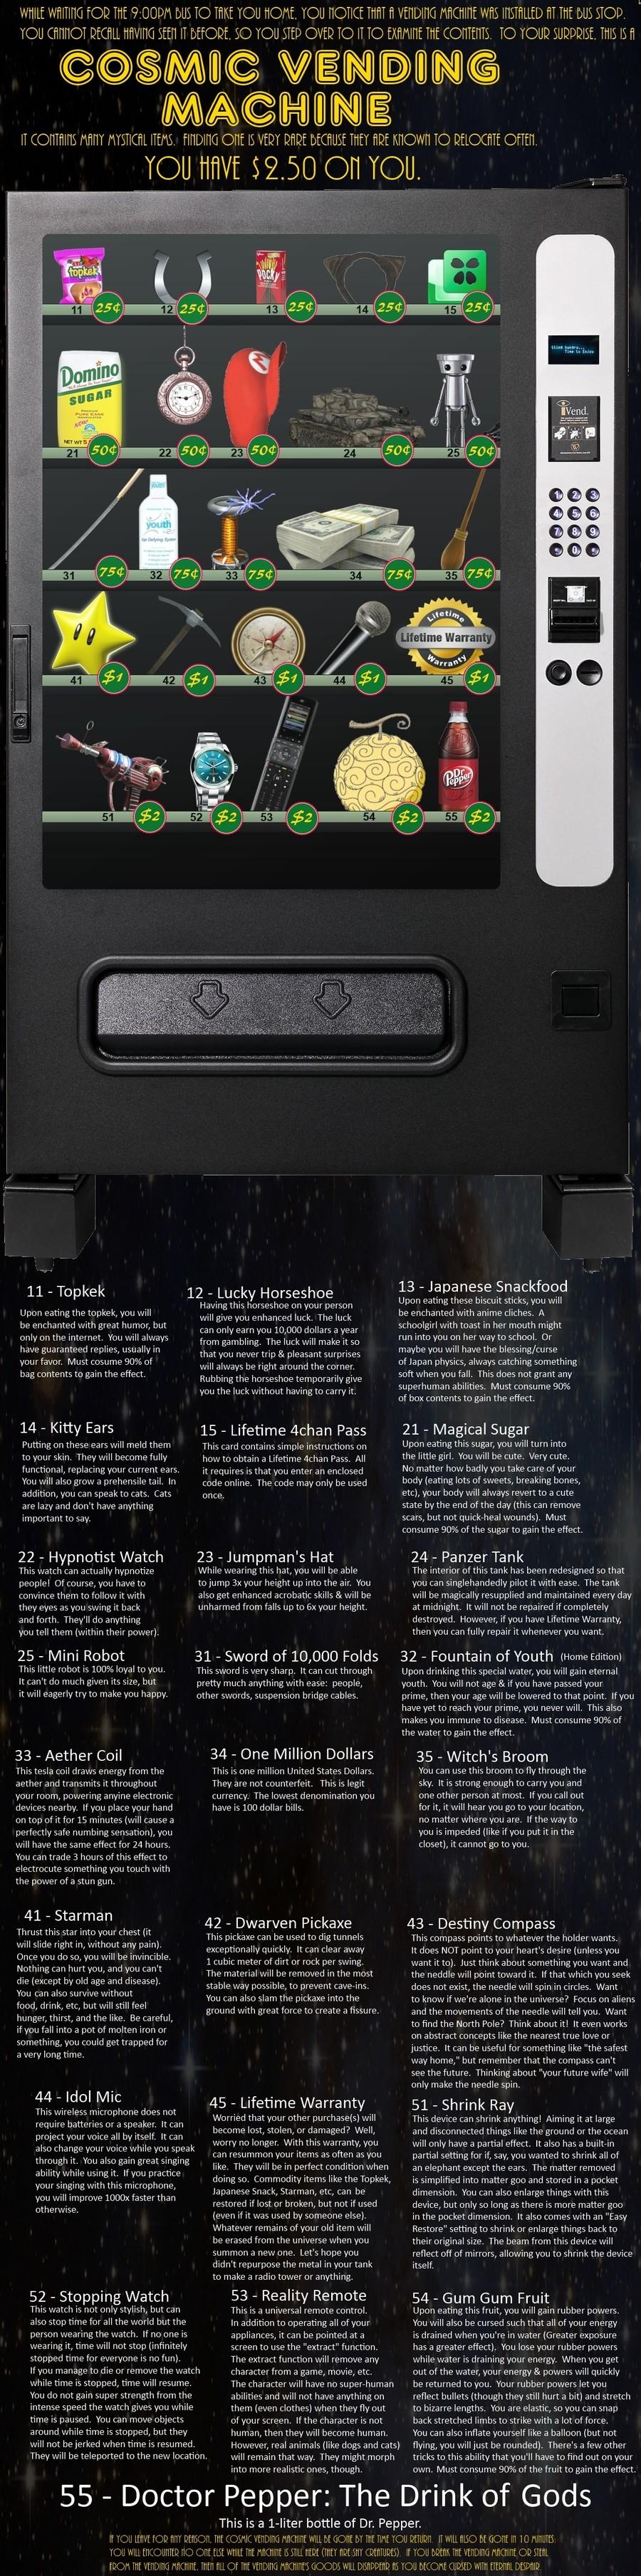 cosmic vending machine. .. get a million dollars buy the rest. CYOA